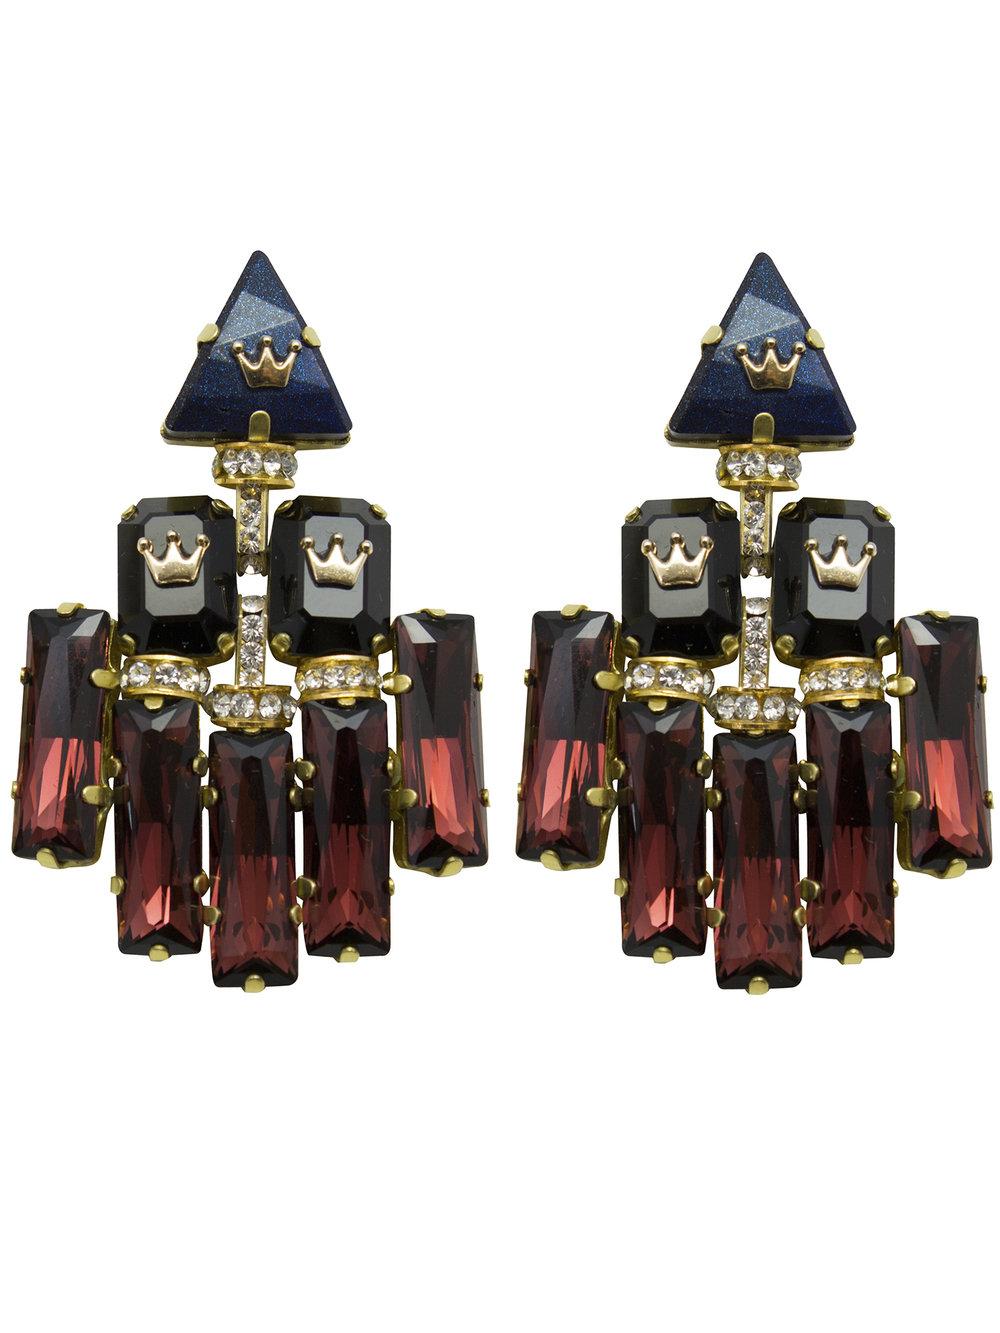 236E Blue Triangle Double Rectangle Deco Earrings.jpg